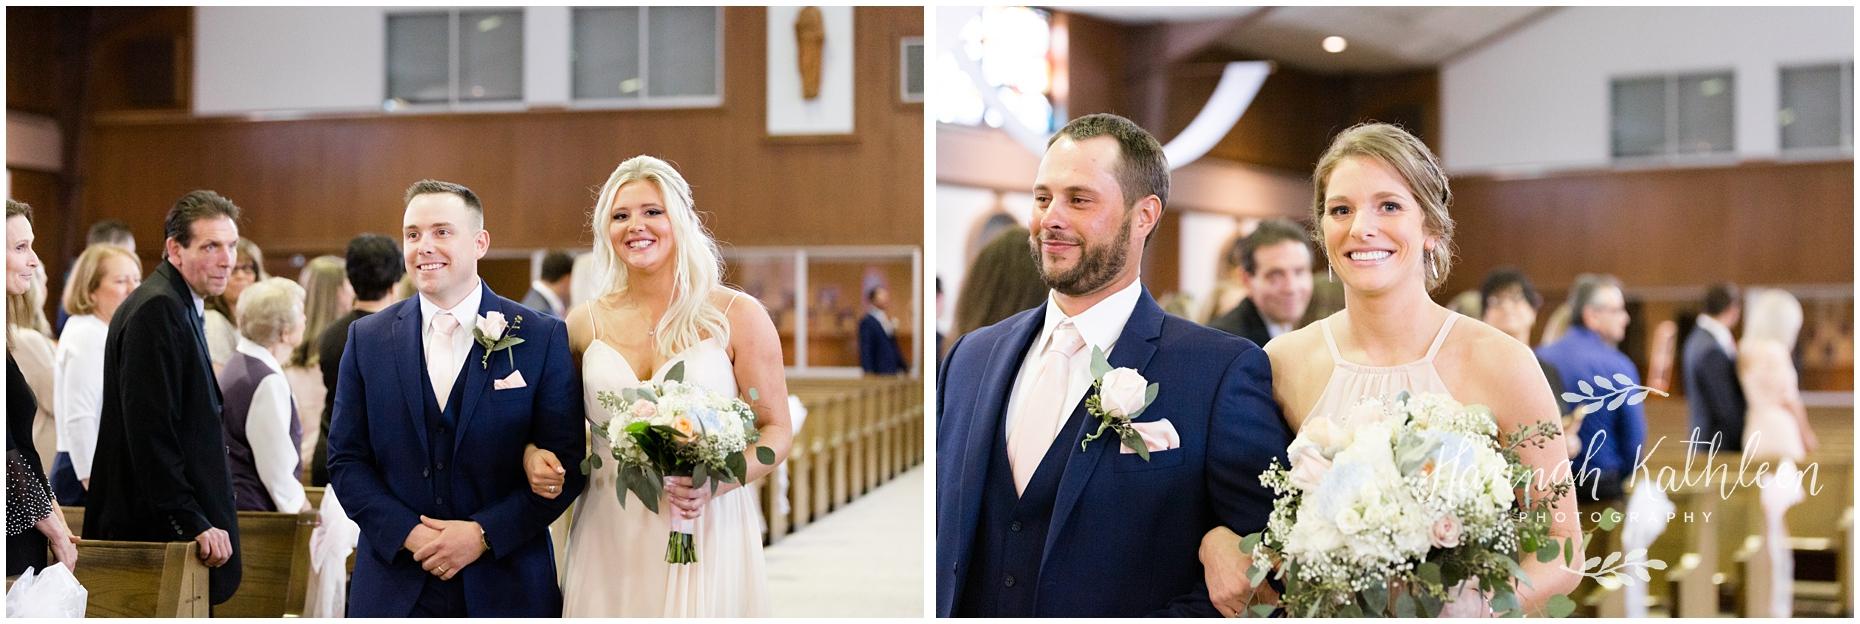 AJ_Brittany_Hotel_Lafayette_Buffalo_NY_Wedding_Photography